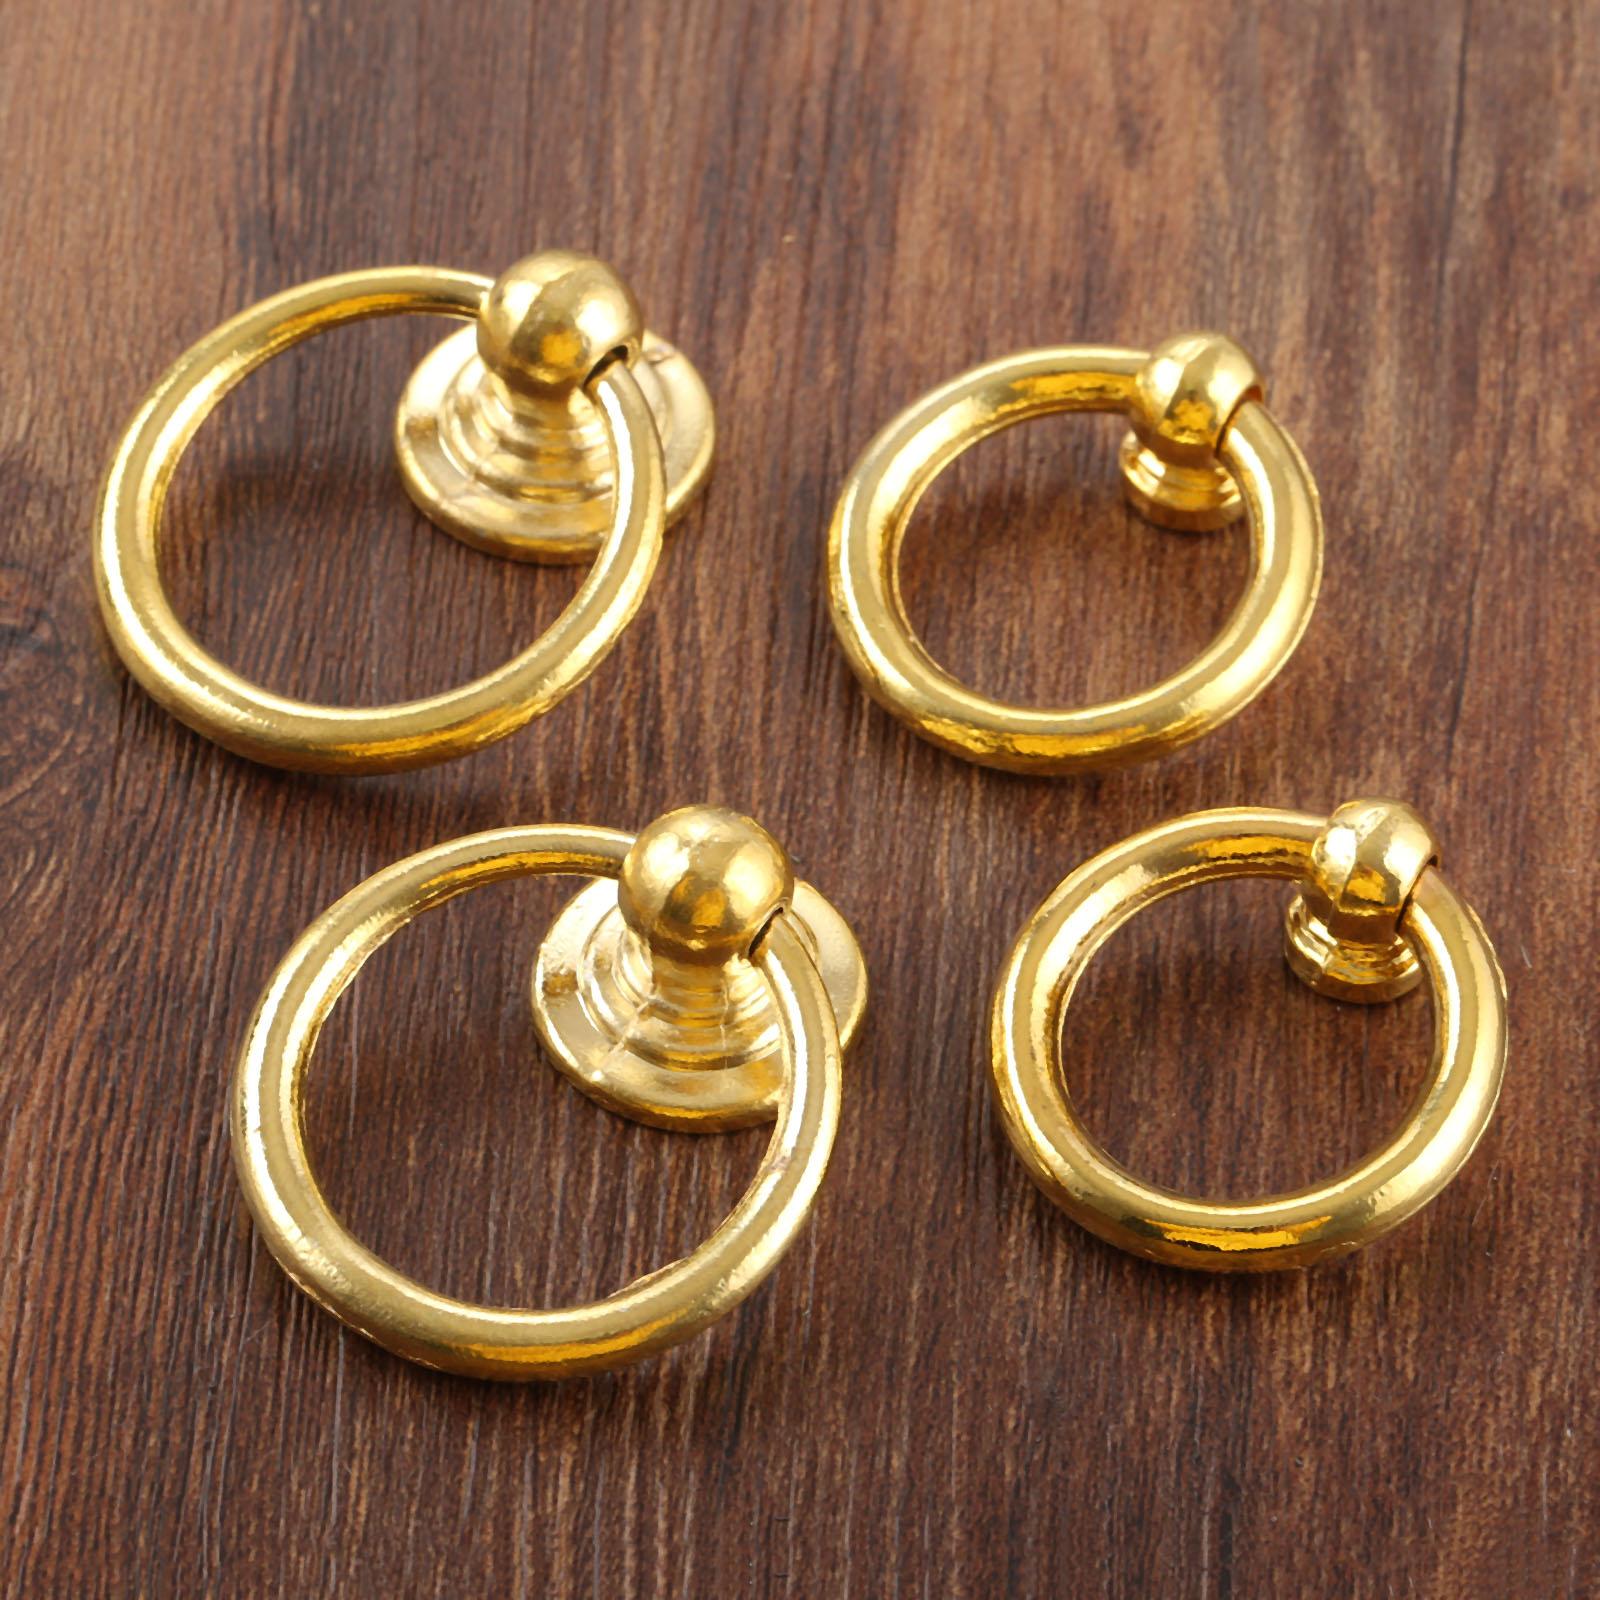 Us 199 30 Offdreld 2 Stks Antieke Gouden Kast Knoppen En Handvat Sieraden Doos Meubels Handvat Kast Lade Deur Ring Knop Meubels Hardware In Kast